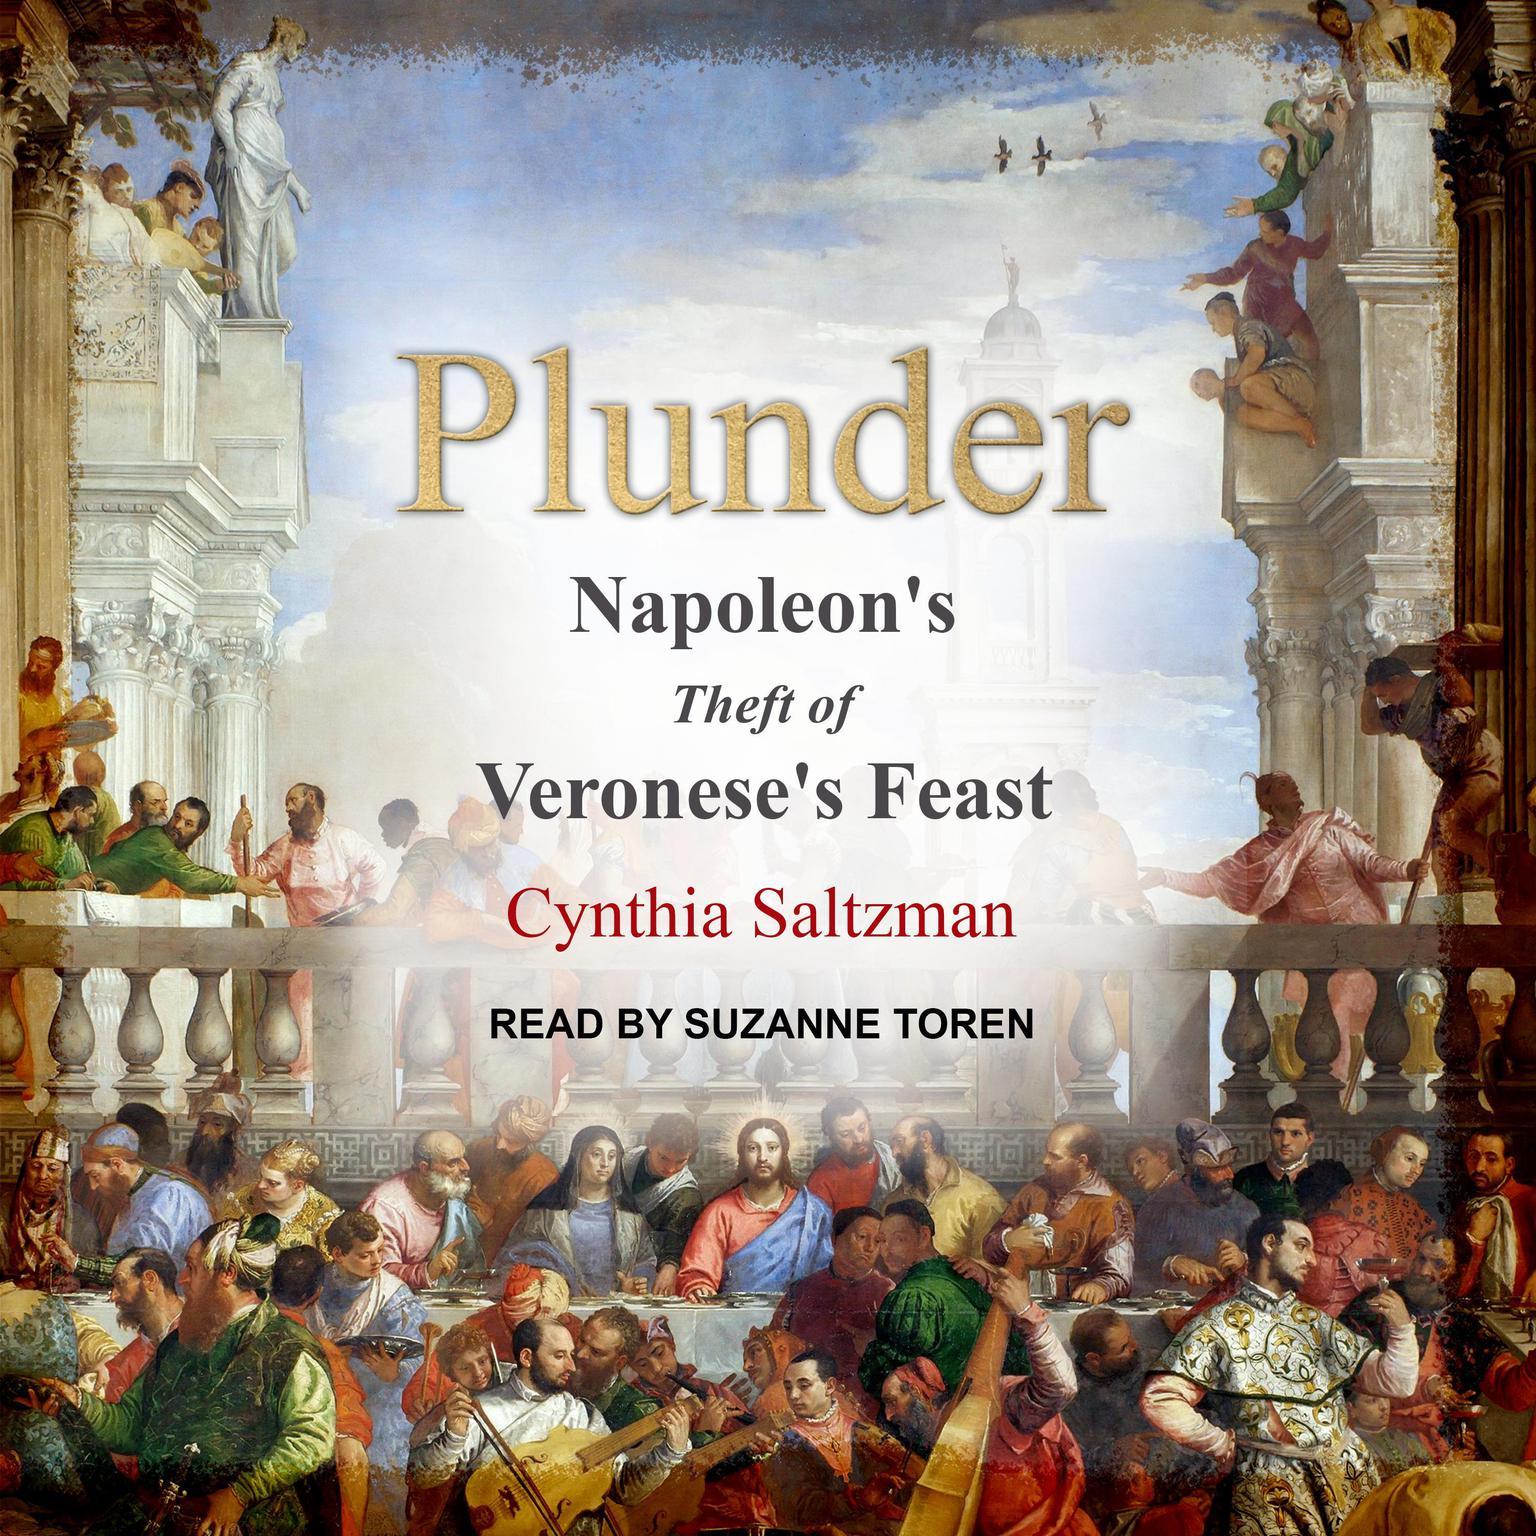 Plunder: Napoleons Theft of Veroneses Feast Audiobook, by Cynthia Saltzman